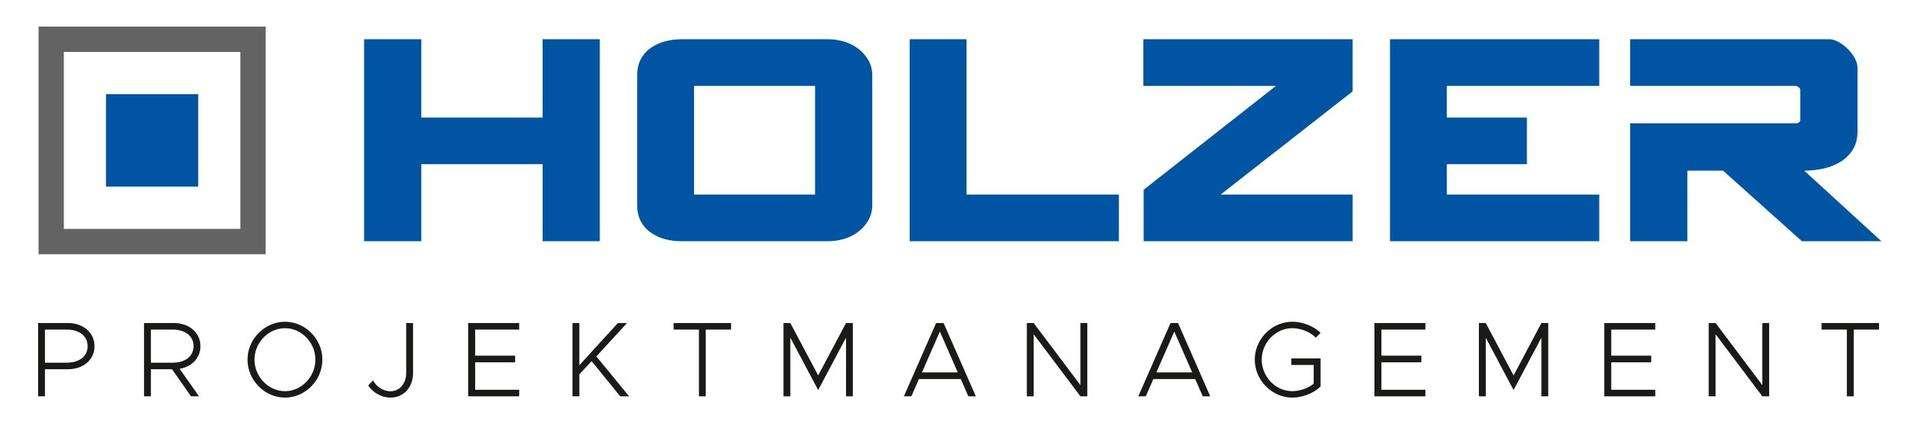 Makler Projektmanagement Holzer GmbH logo